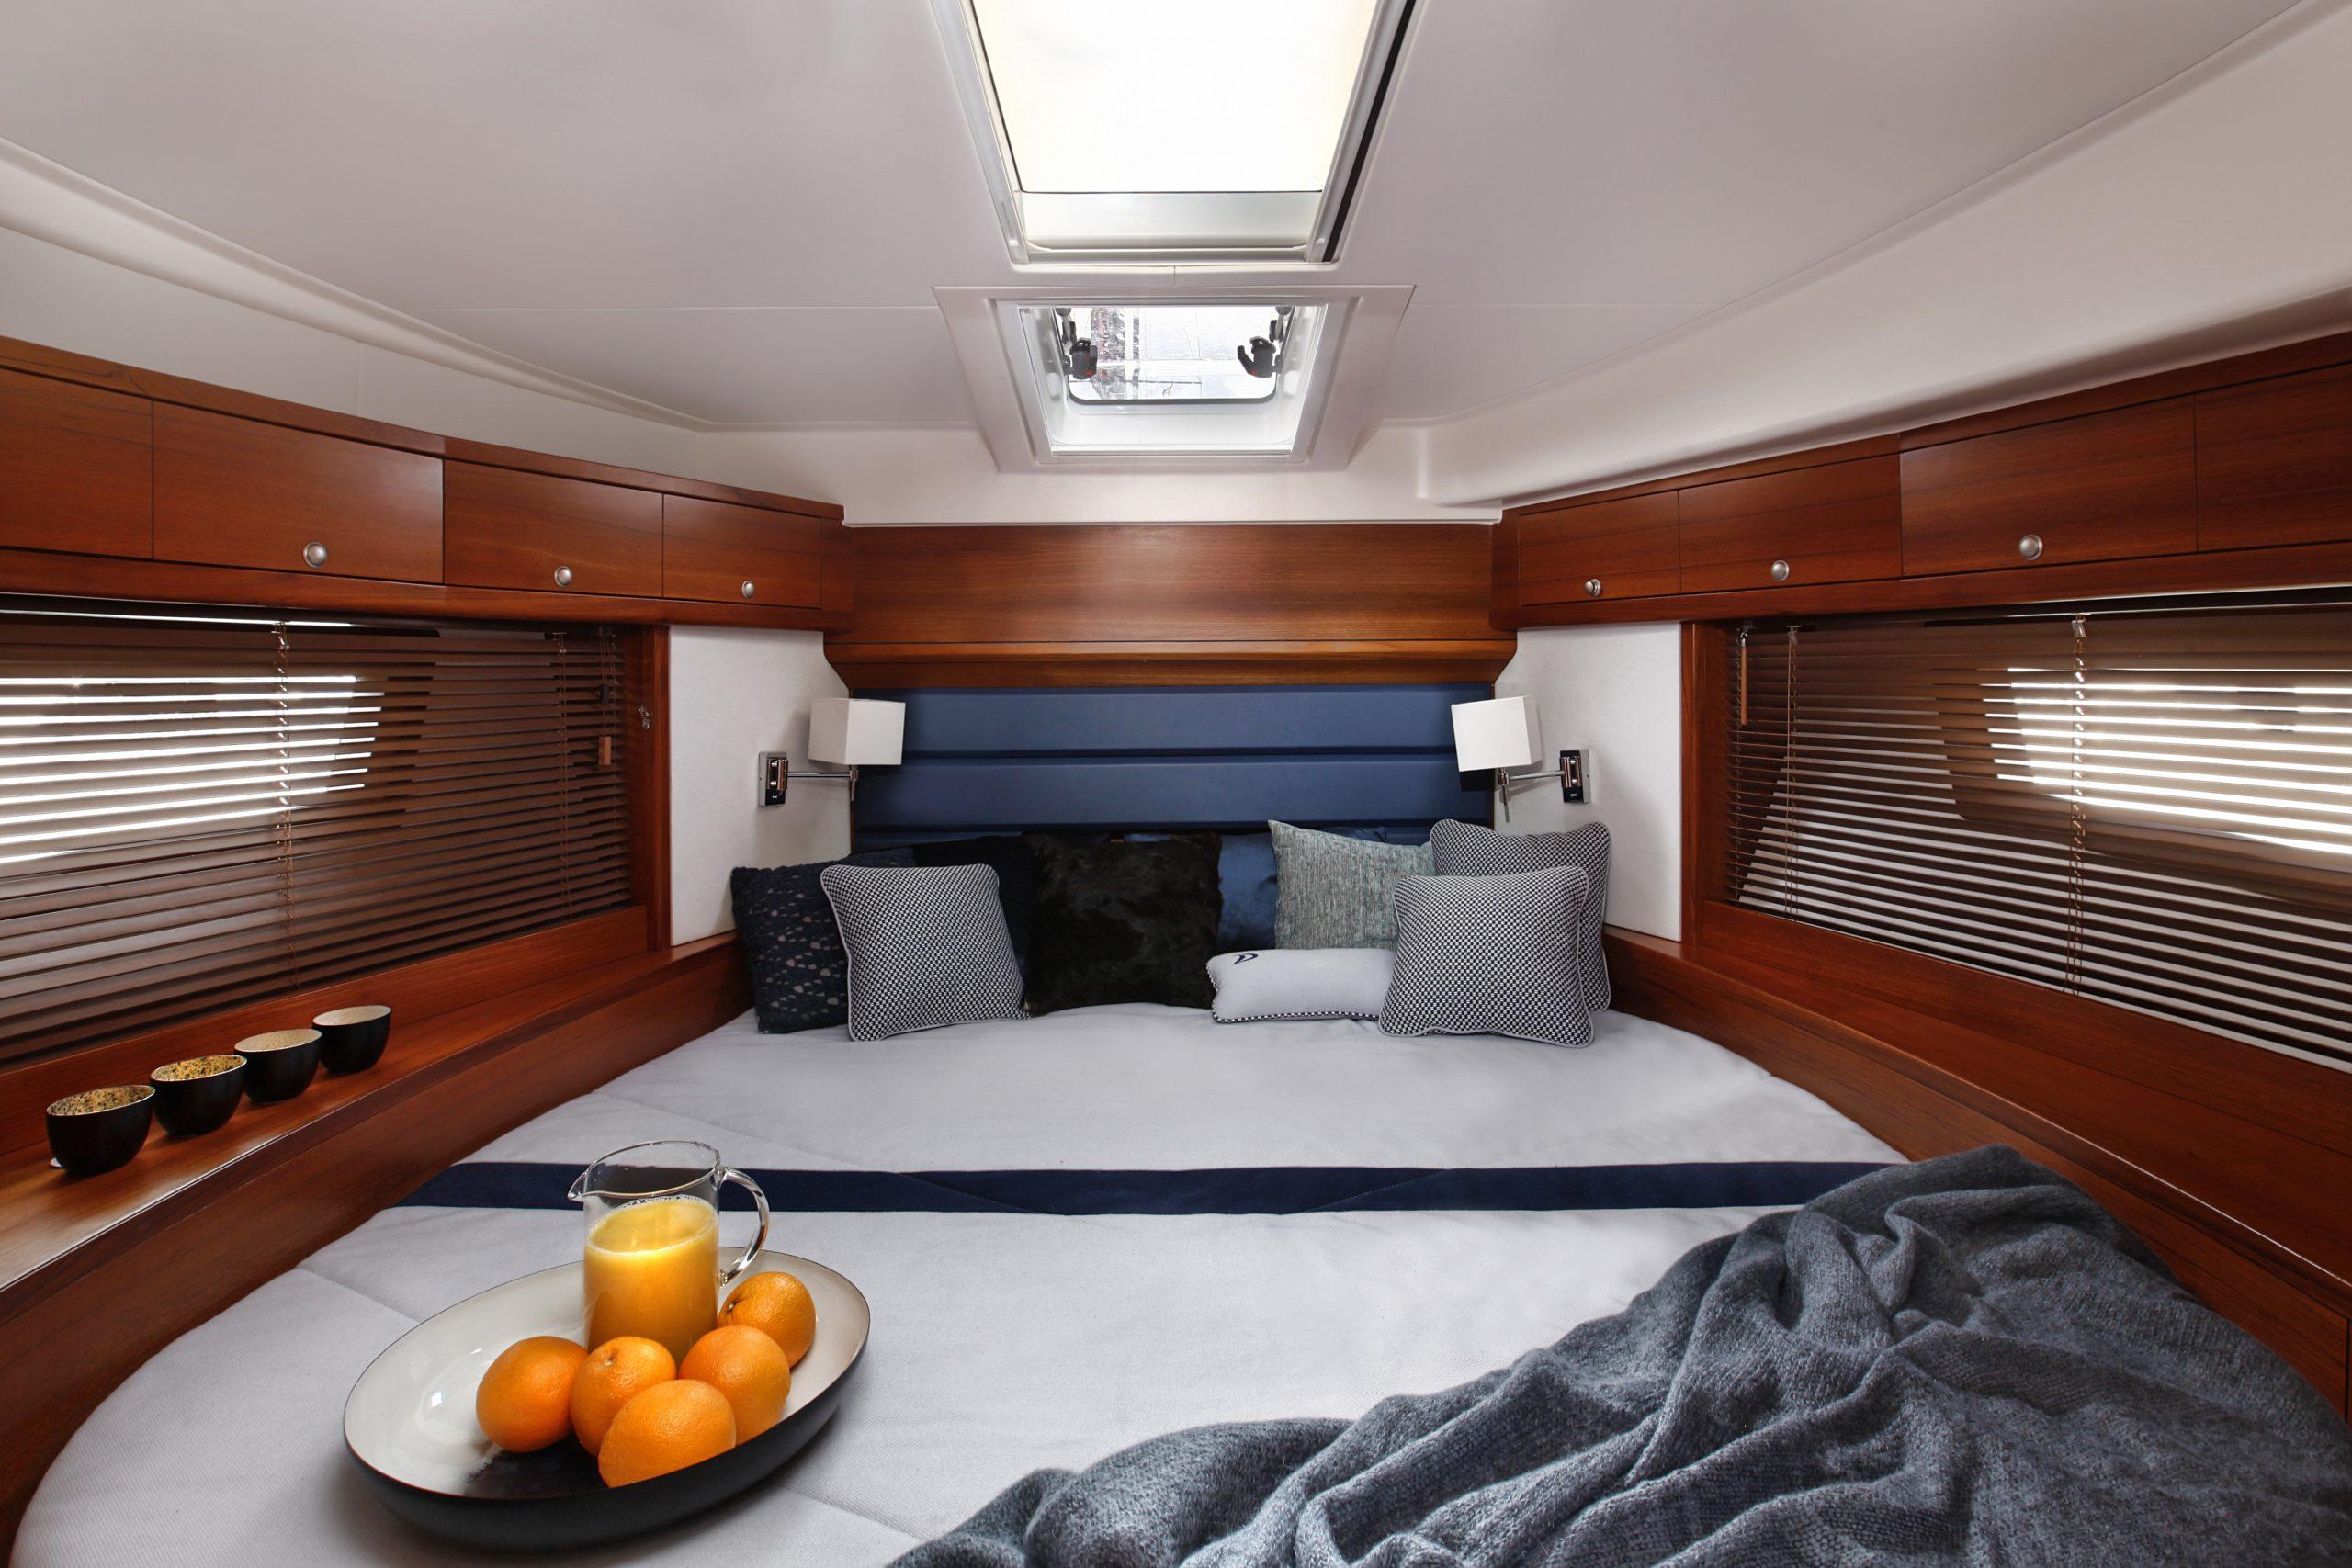 Materace kabiny, adriatica